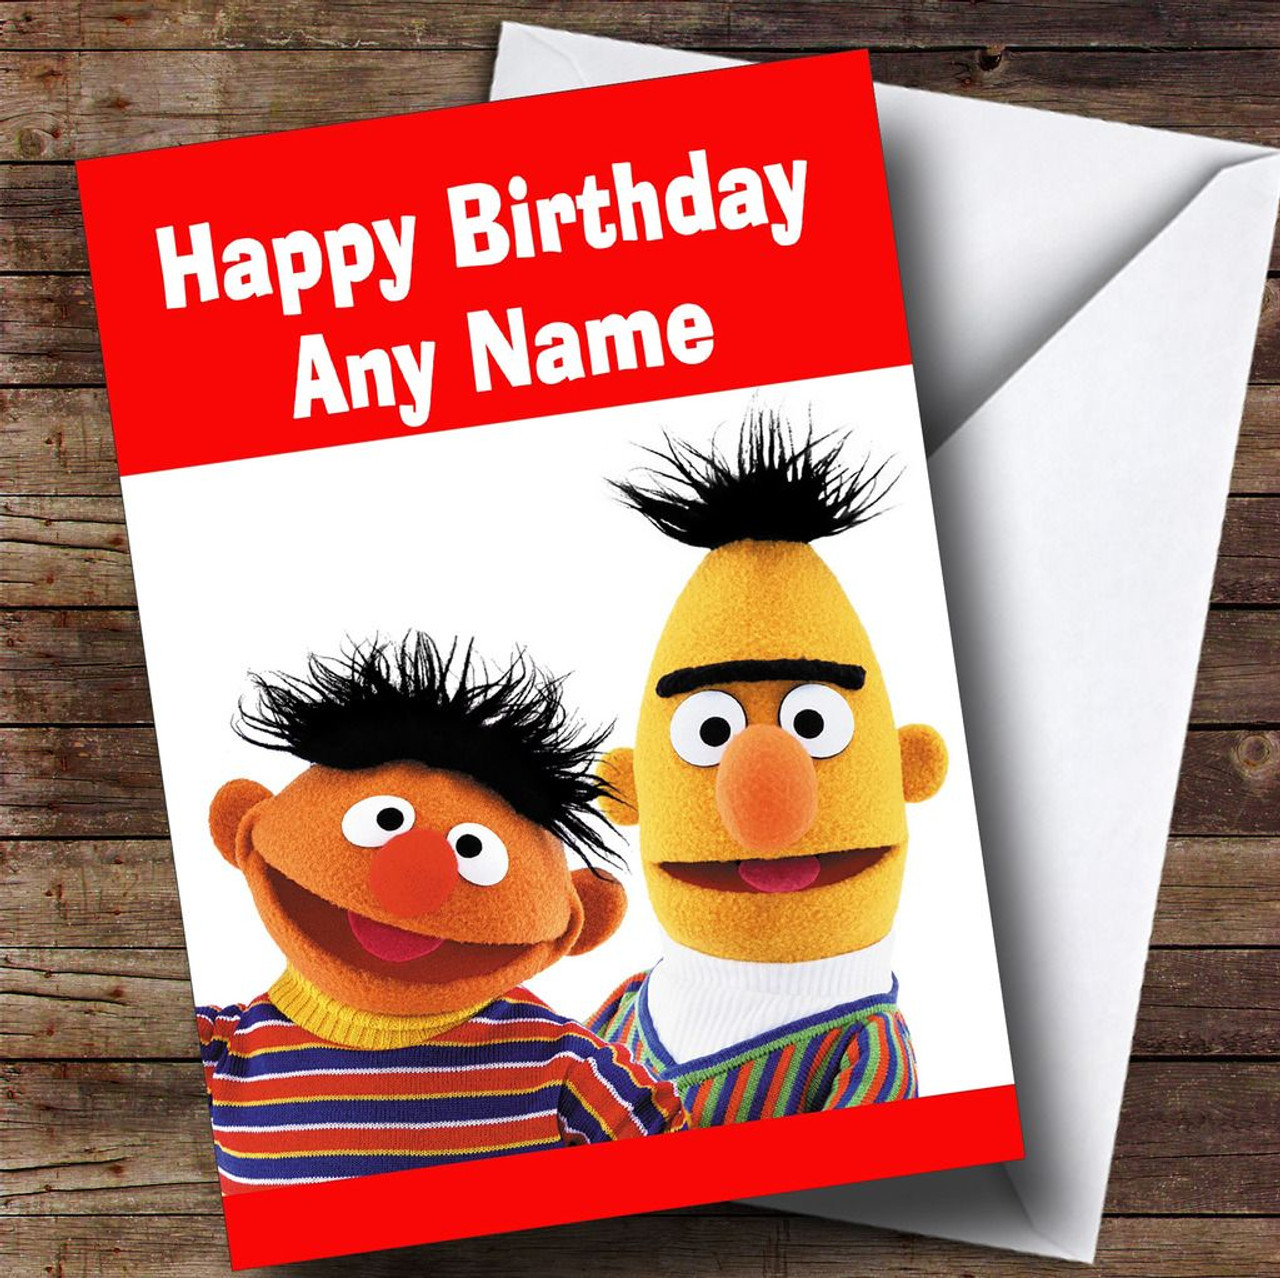 Personalised cards birthday cards kids tv film character bert and ernie personalised childrens birthday card kristyandbryce Gallery